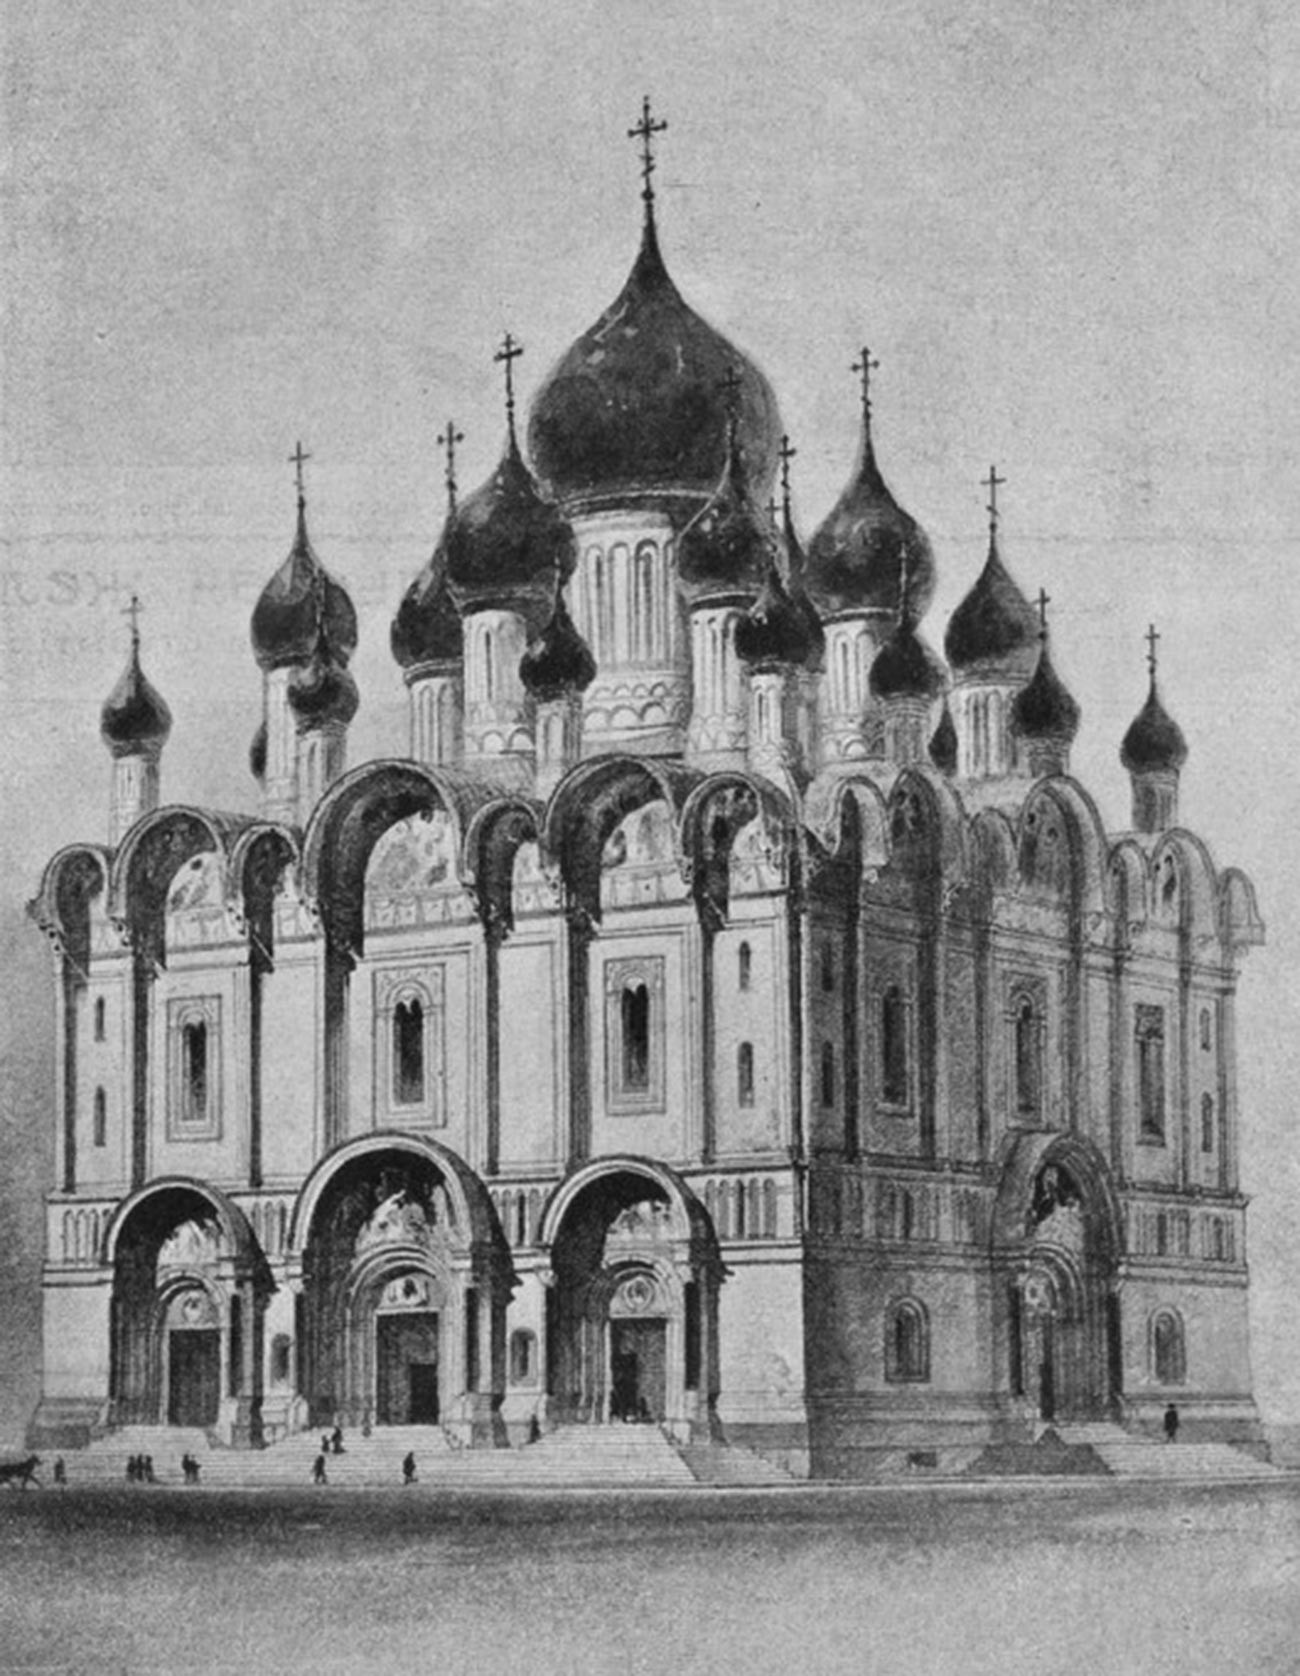 Zunanjost katedrale. Risba po projektu A. N. Pomeranceva, 1904